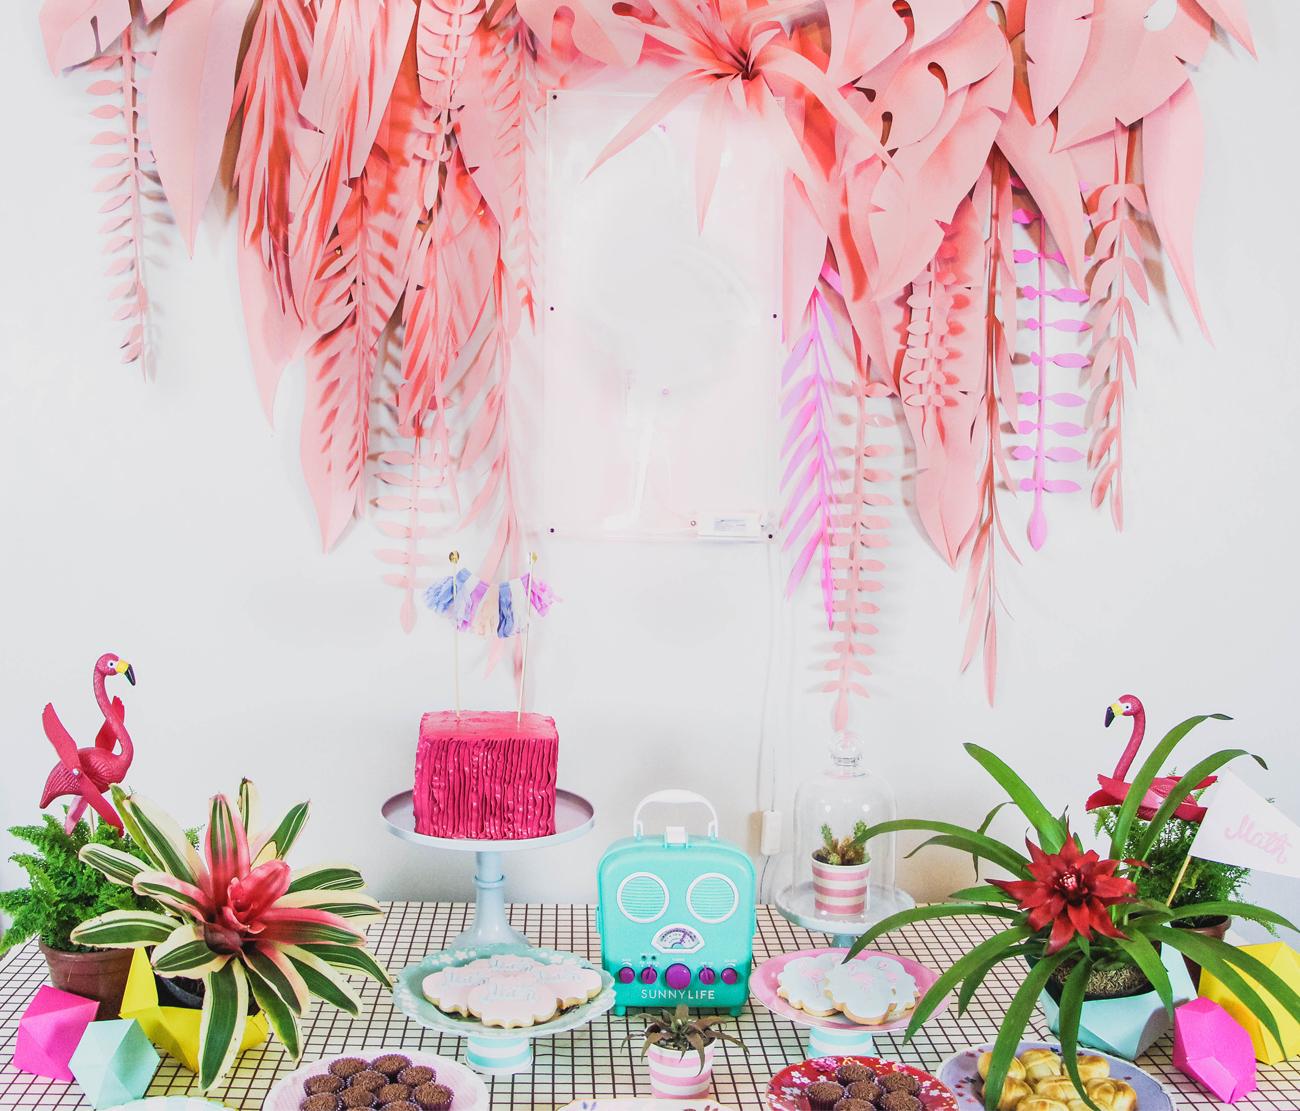 blog do math brasilia sunnylife retro radio plastic pink flamingo